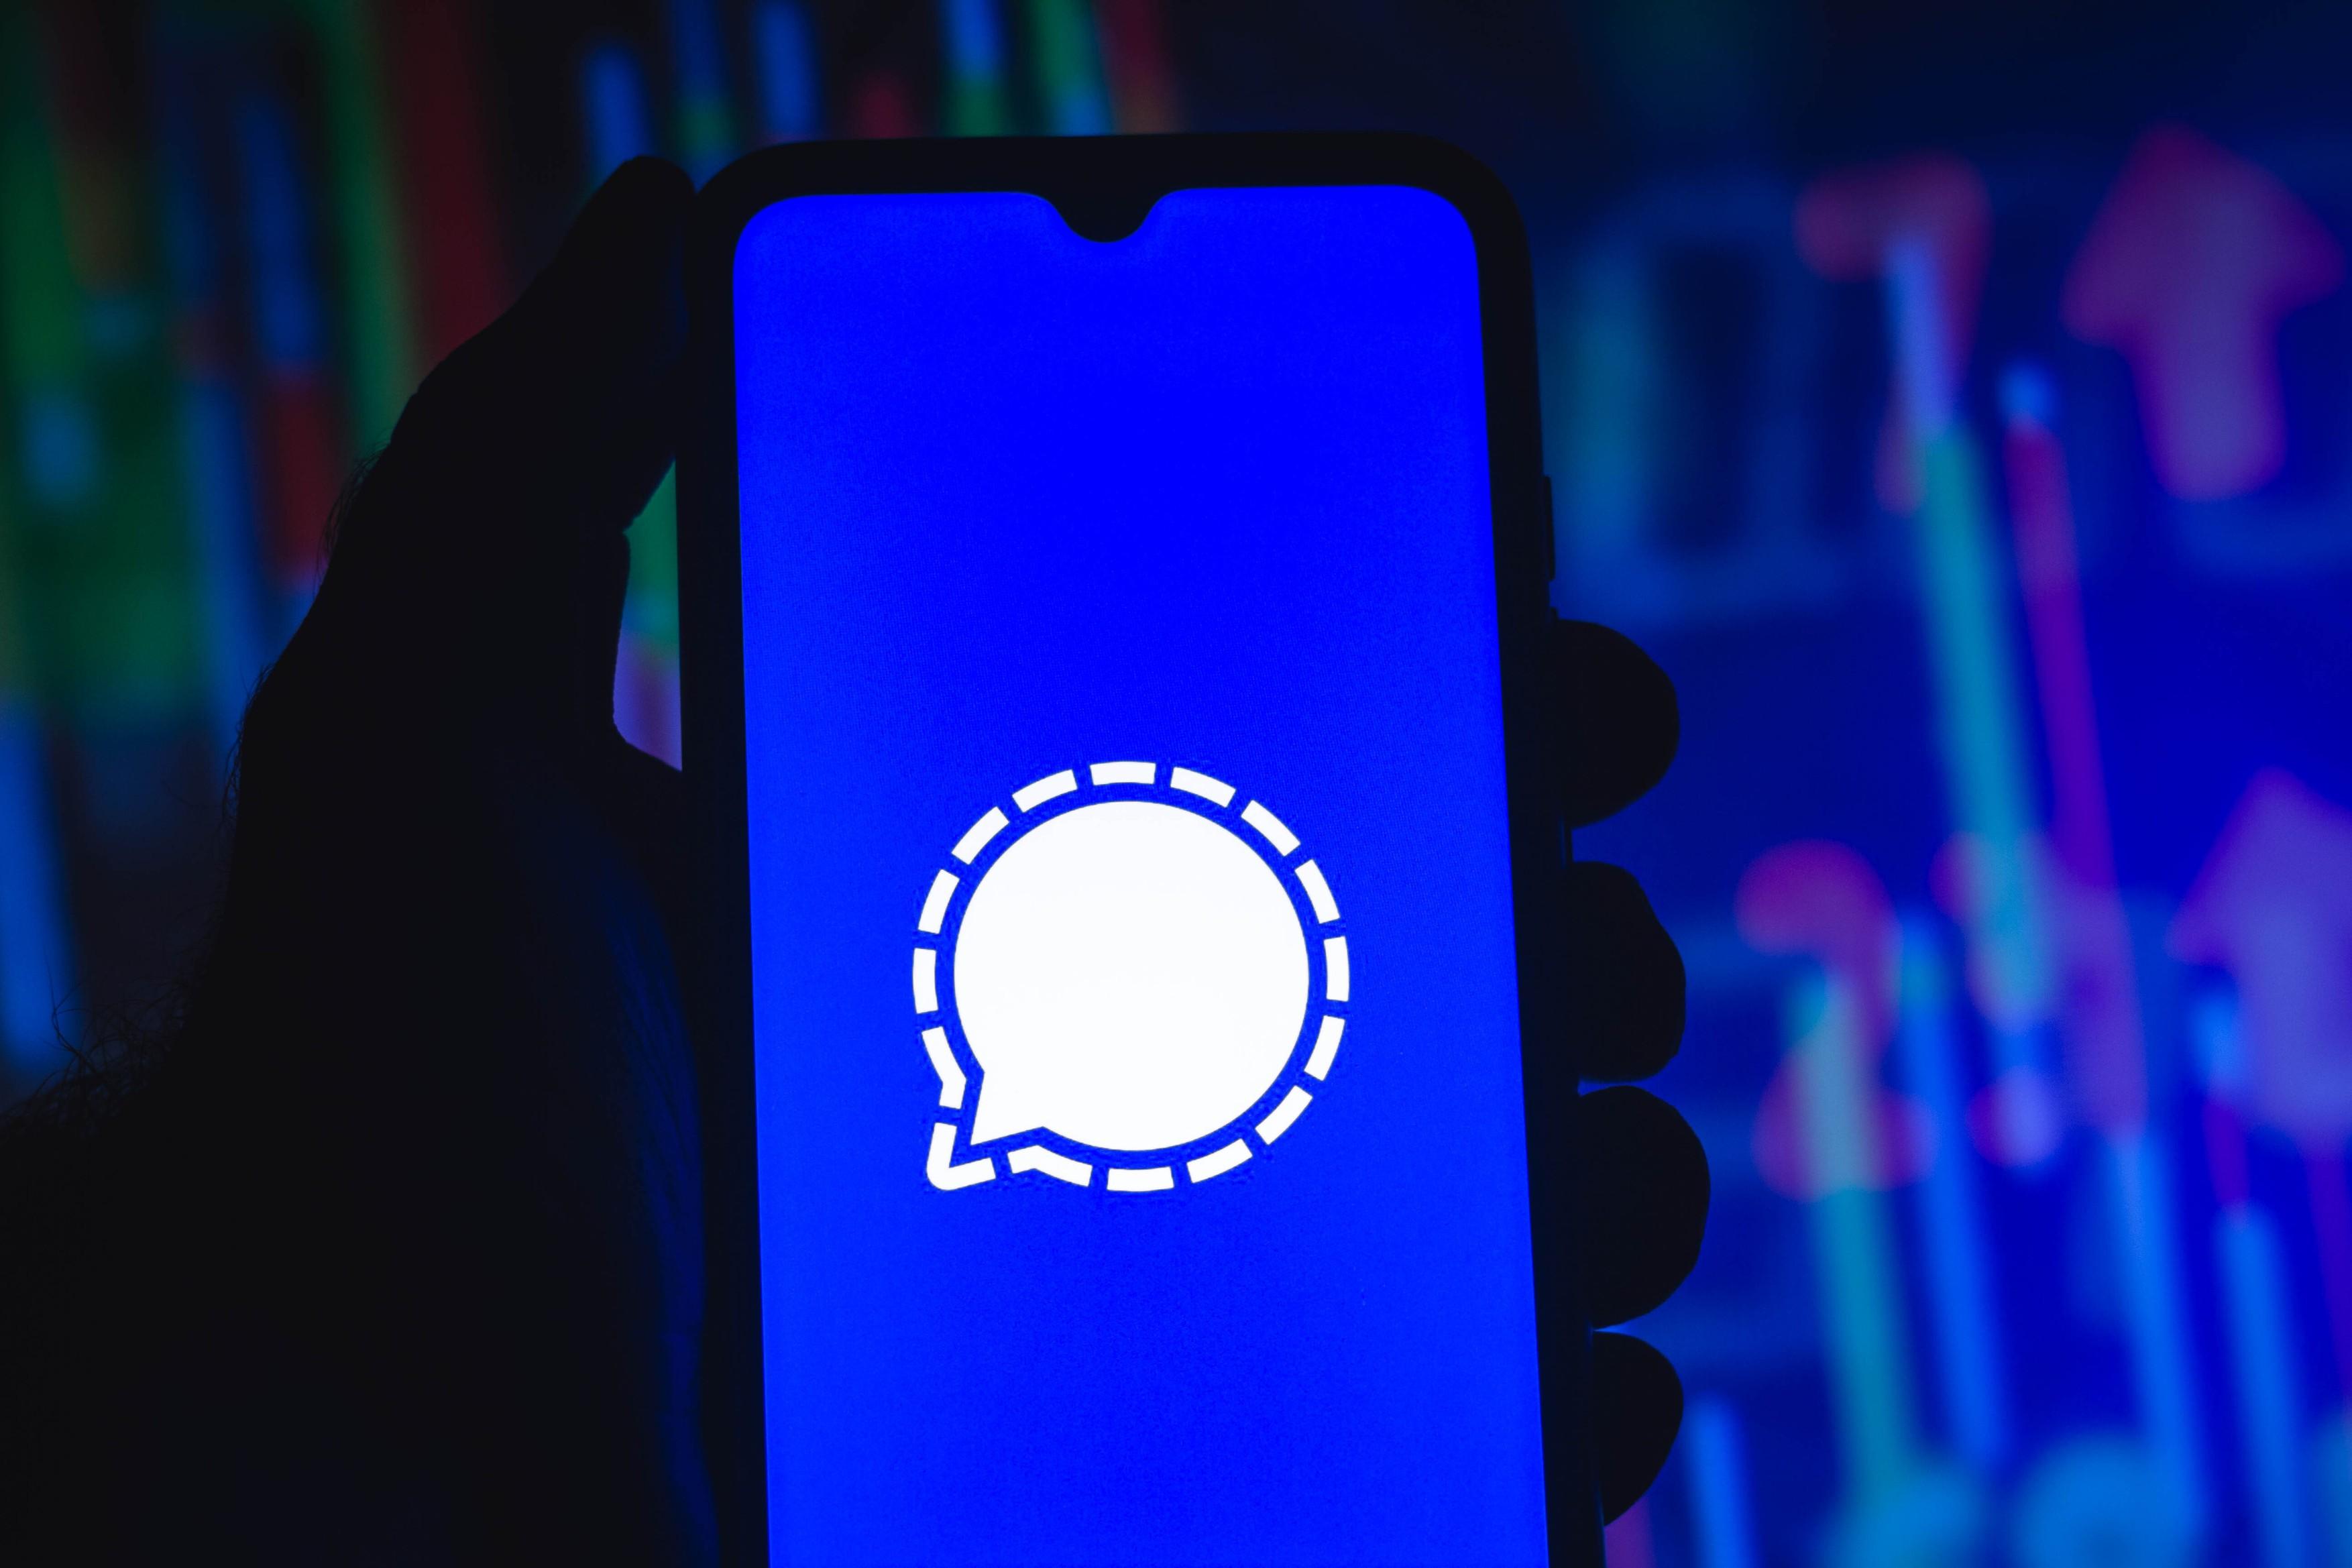 Platforma de mesaje Signal a anuntat ca a reusit sa isi rezolve problemele tehnice